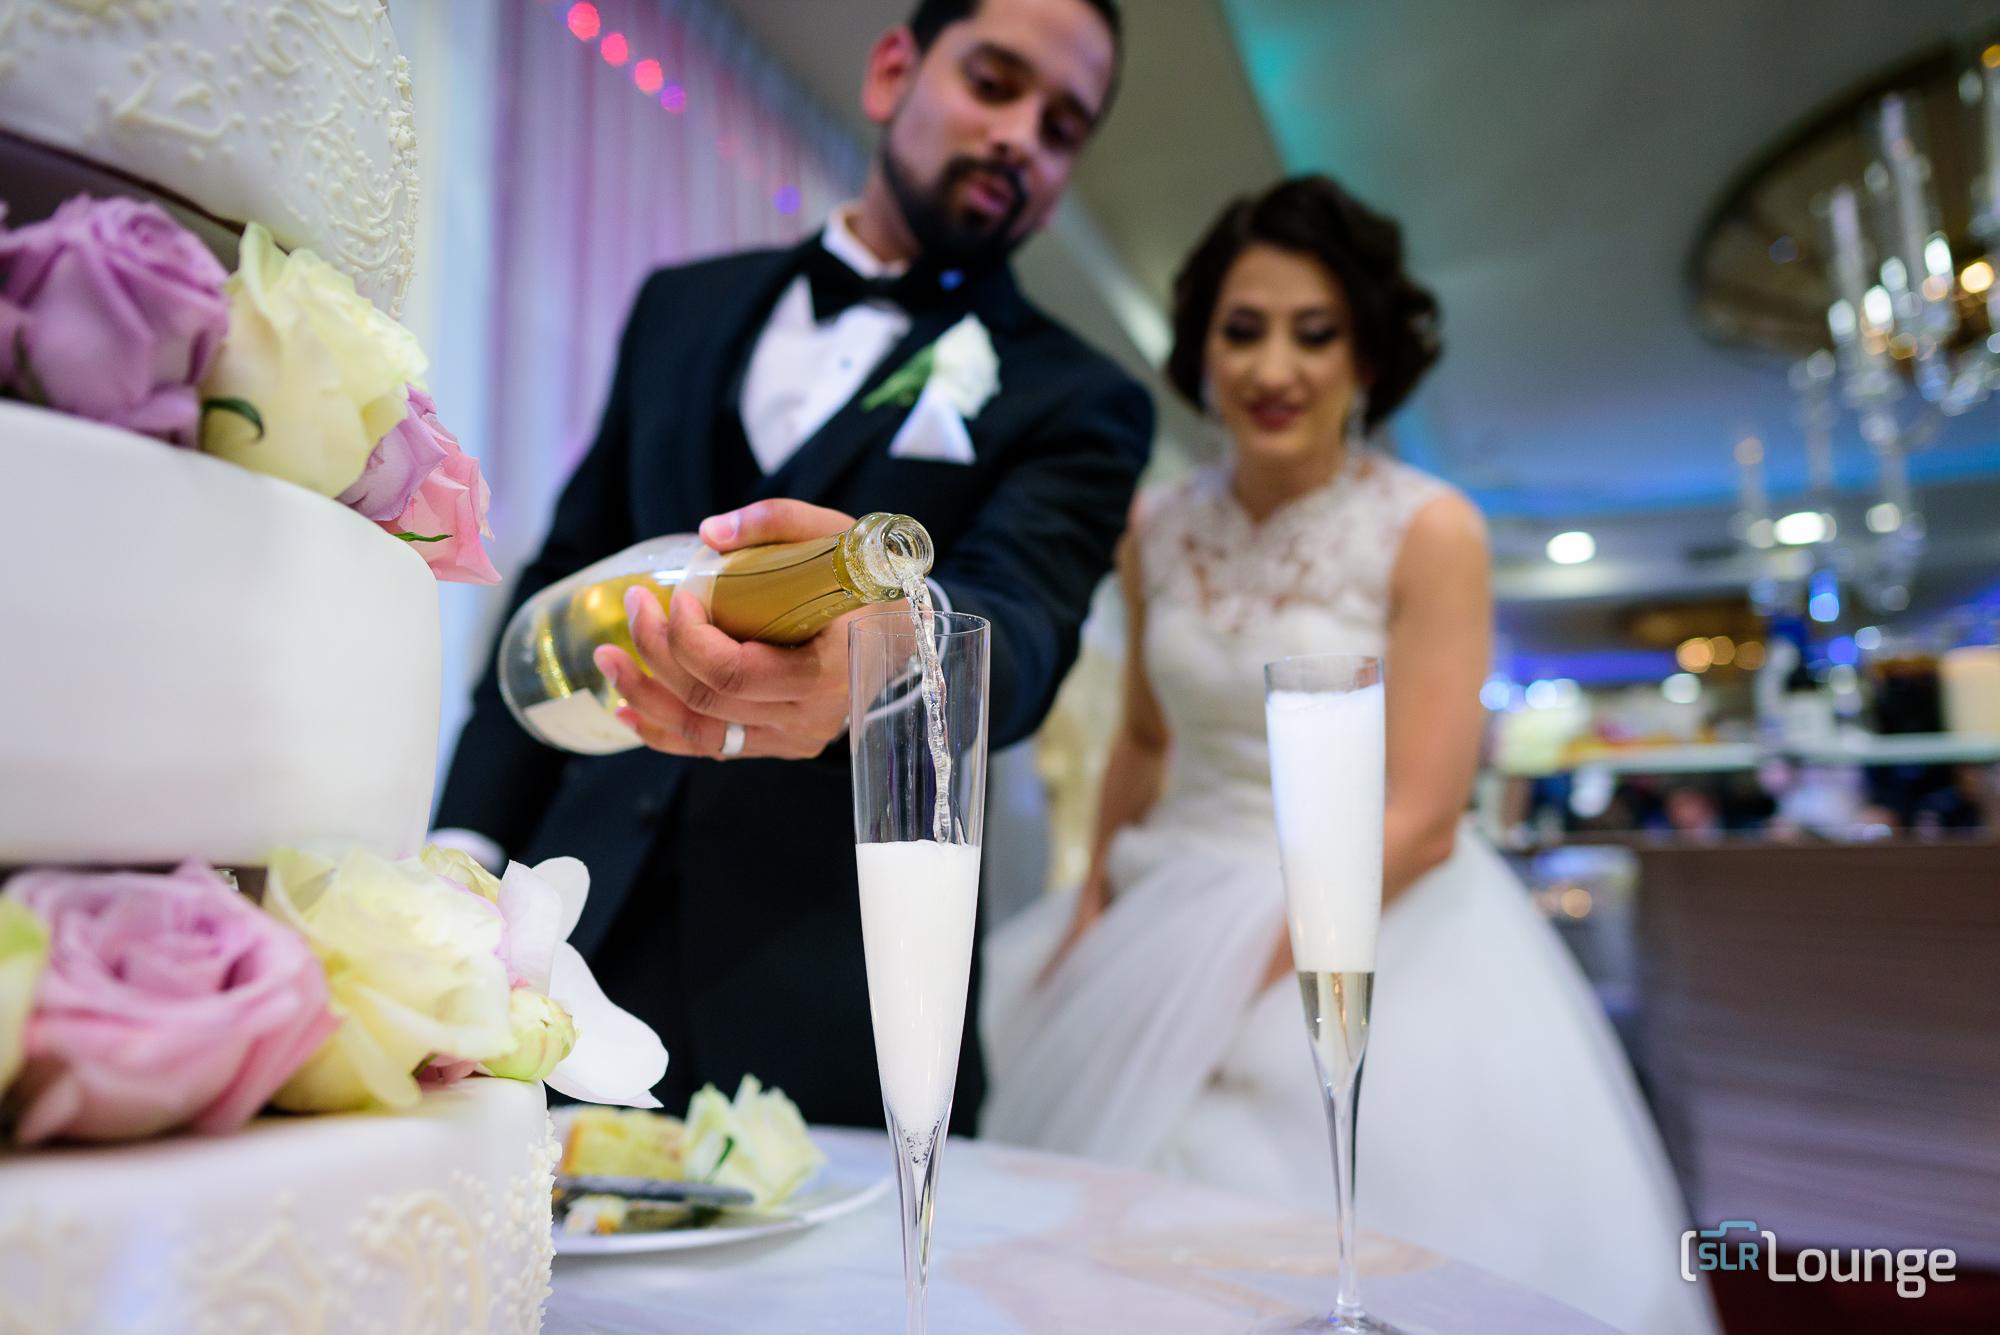 Nikon-24mm-18-Review-Wedding-Lens-06.jpg